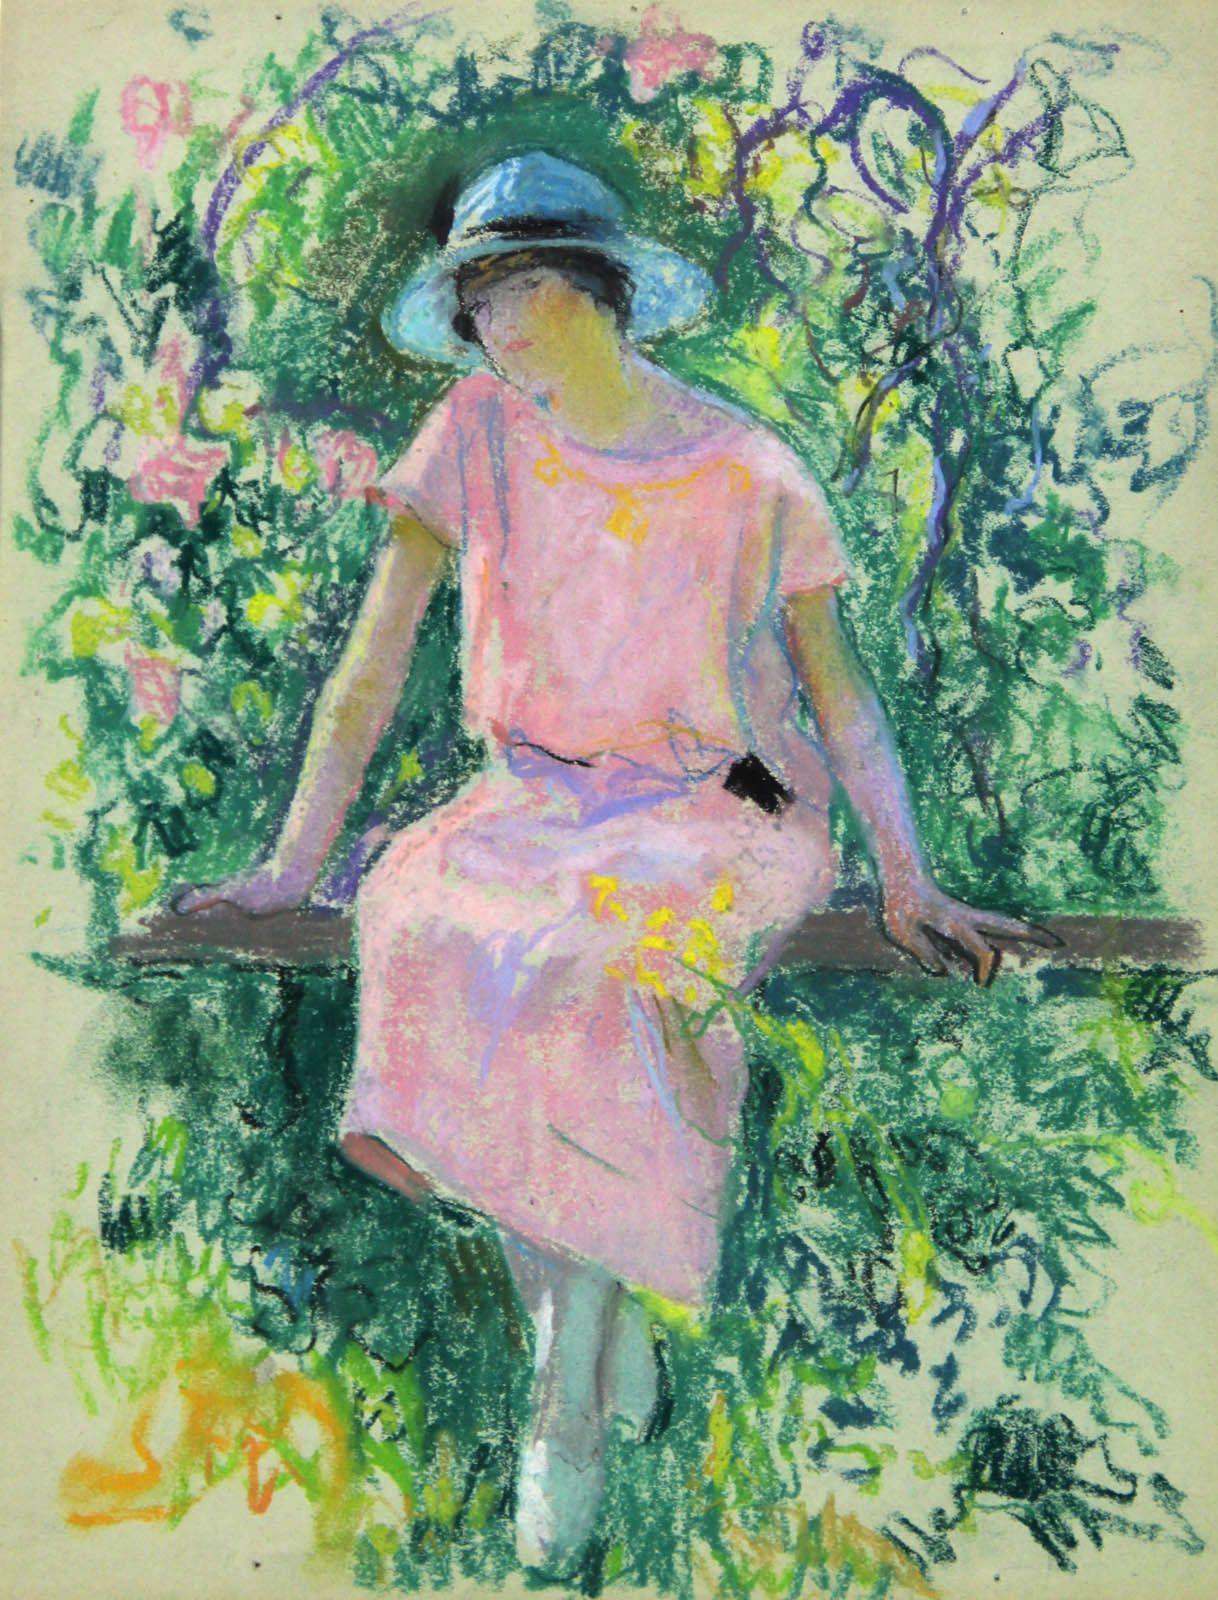 Rose amongst the roses - Raymond Thibesart French, 1874-1968 Pastel on paper , 32 x 24 cm